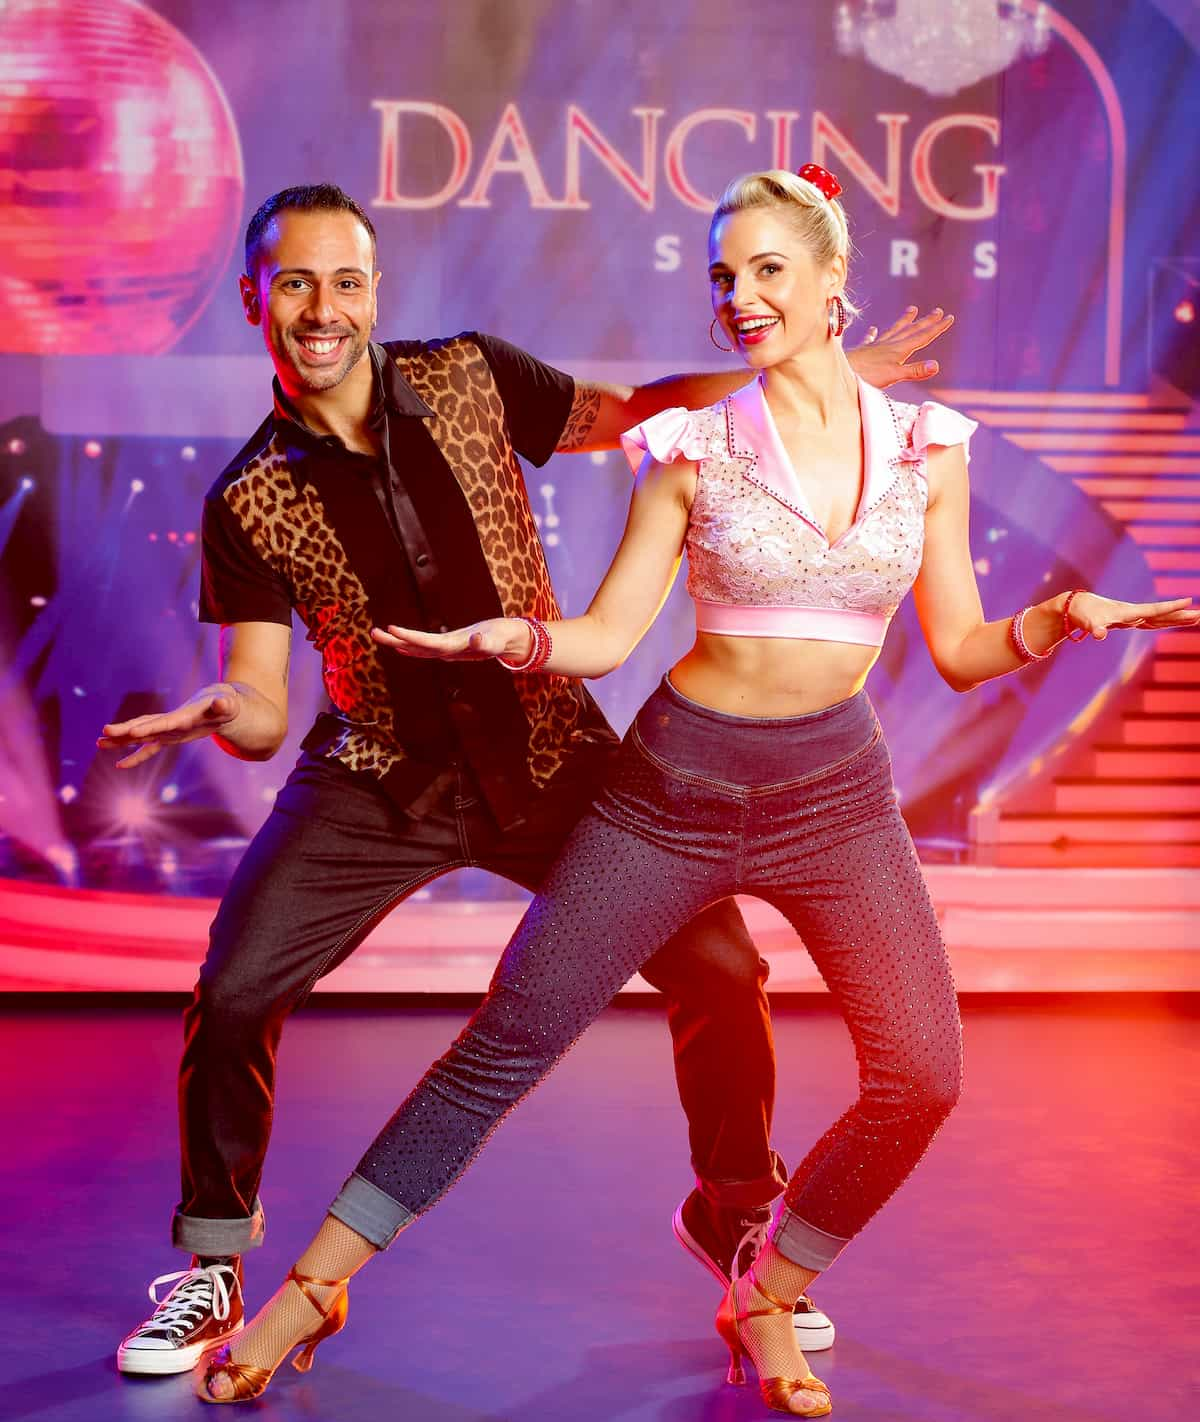 Dancing Stars am 13.11.2020 - Danilo Campisi und Silvia Schneider